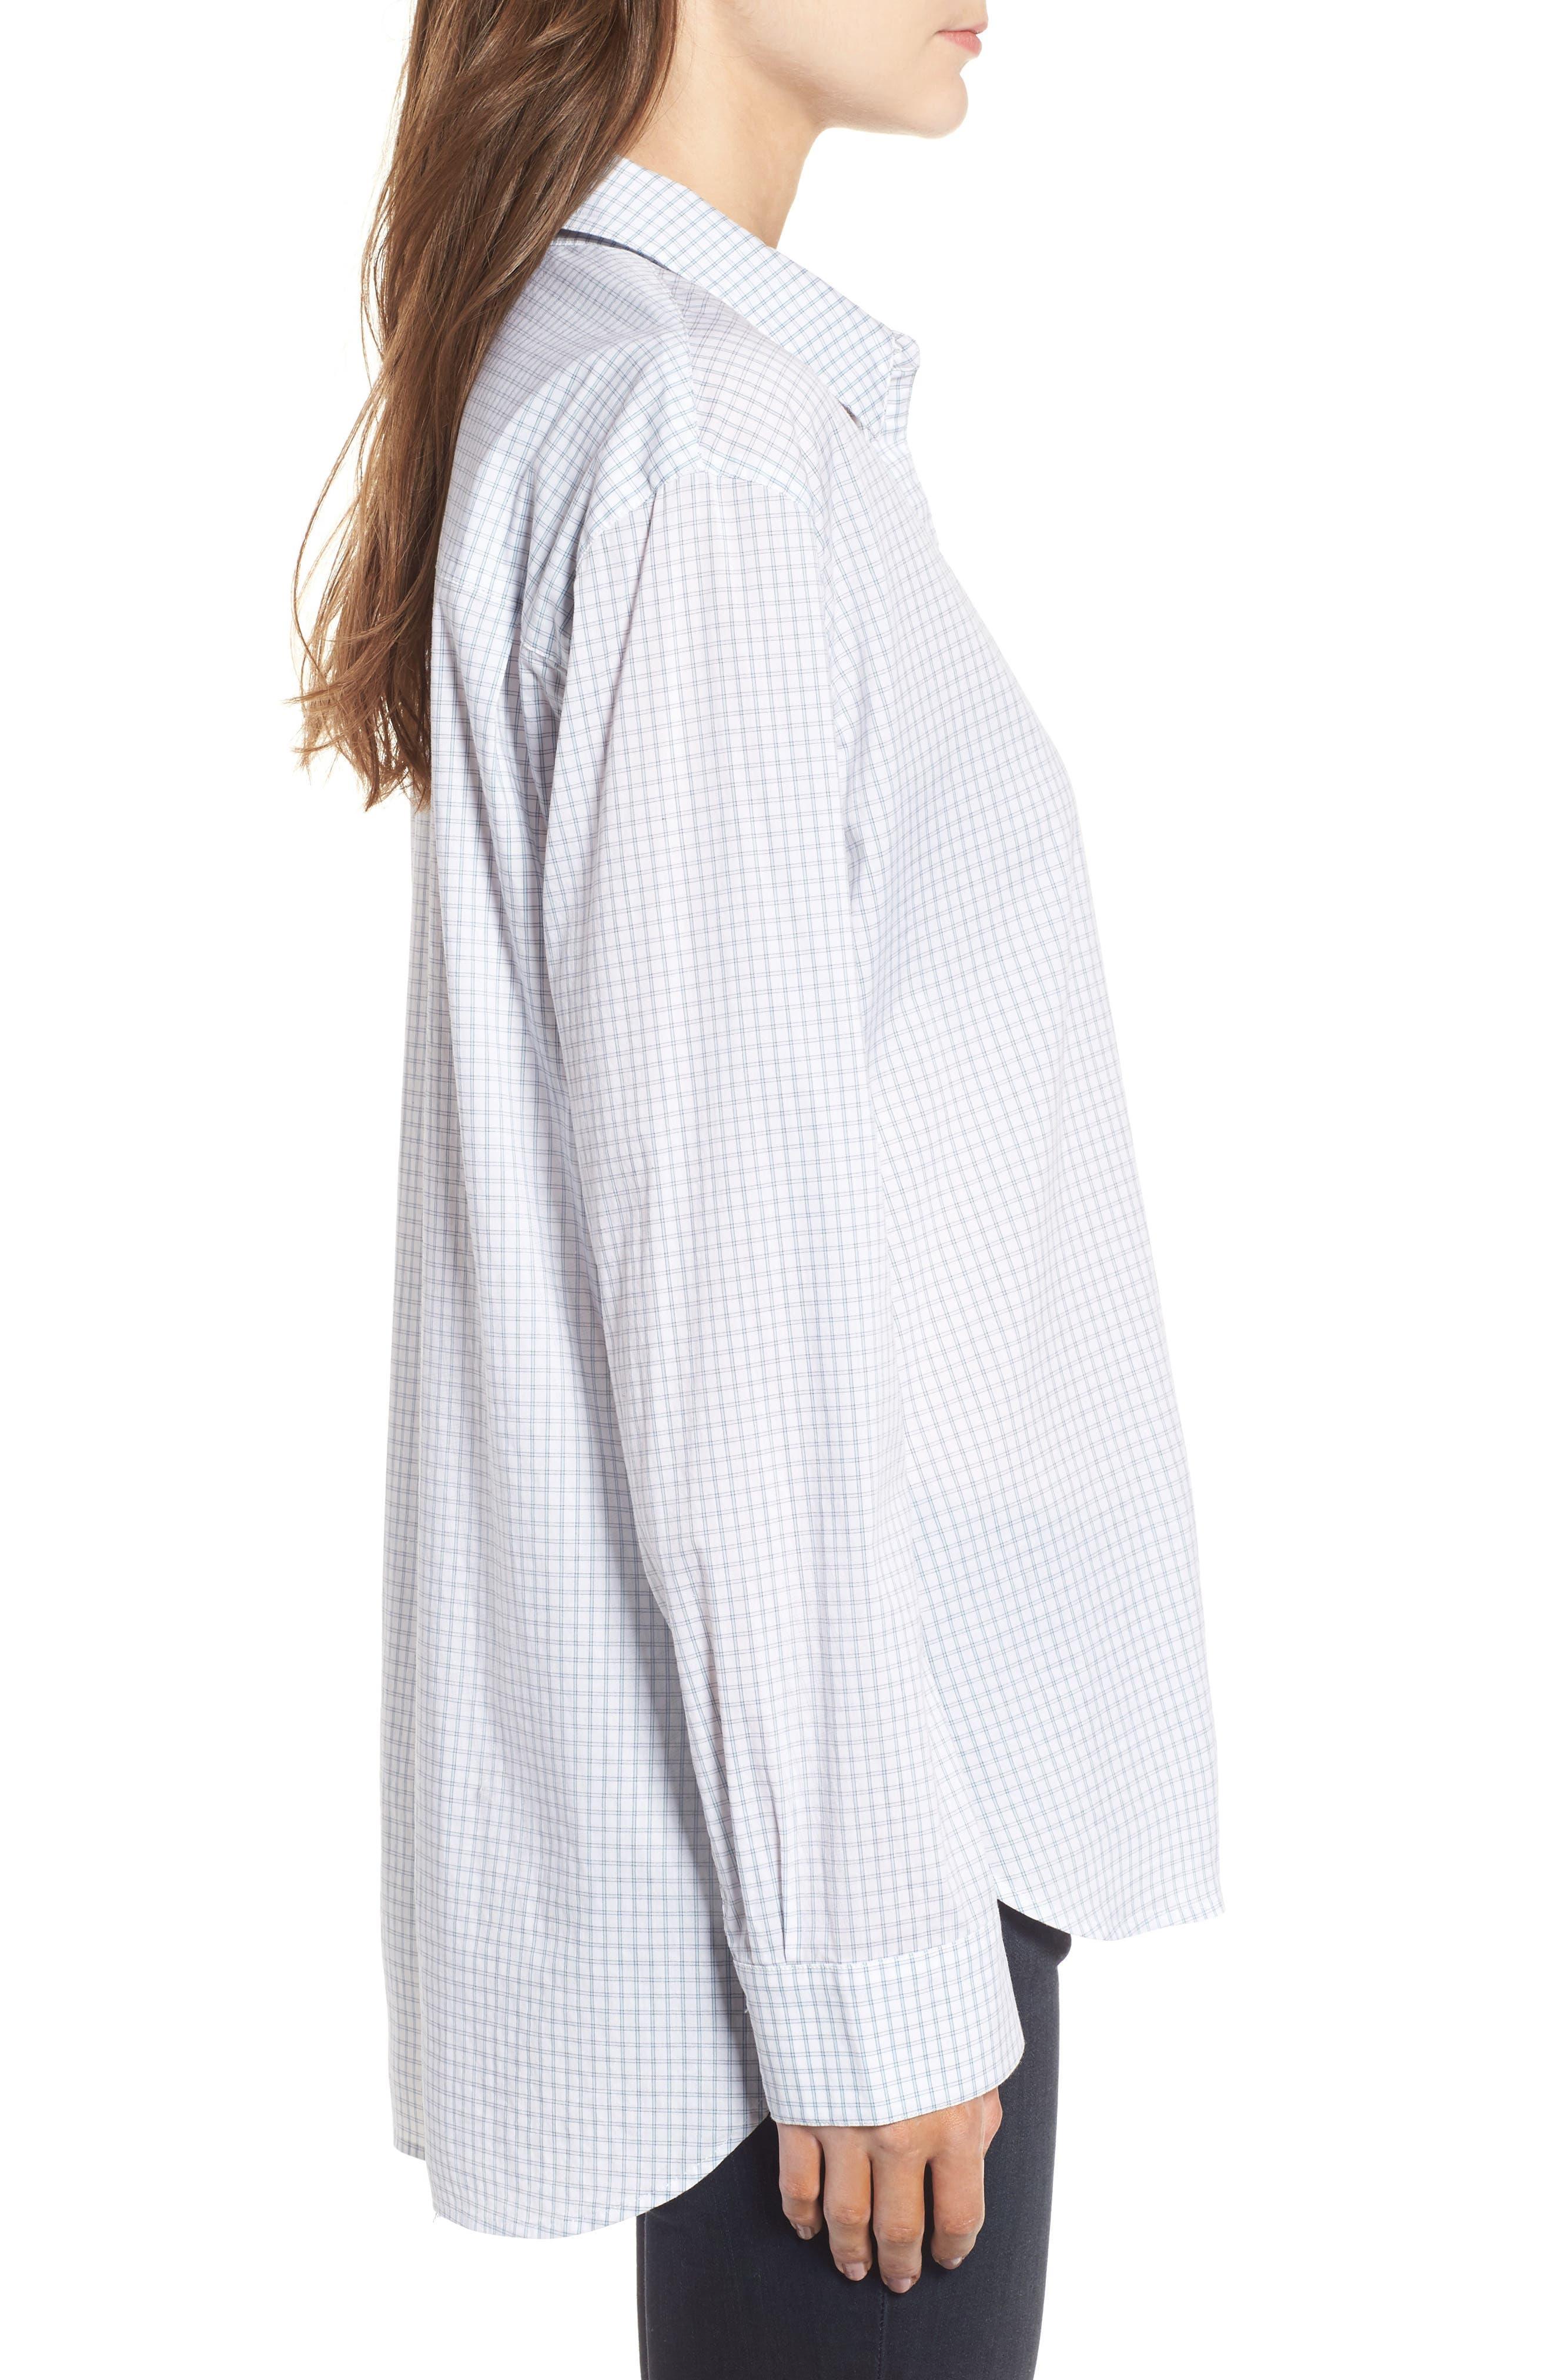 Oversize Check Shirt,                             Alternate thumbnail 3, color,                             White Blue Poplin Check